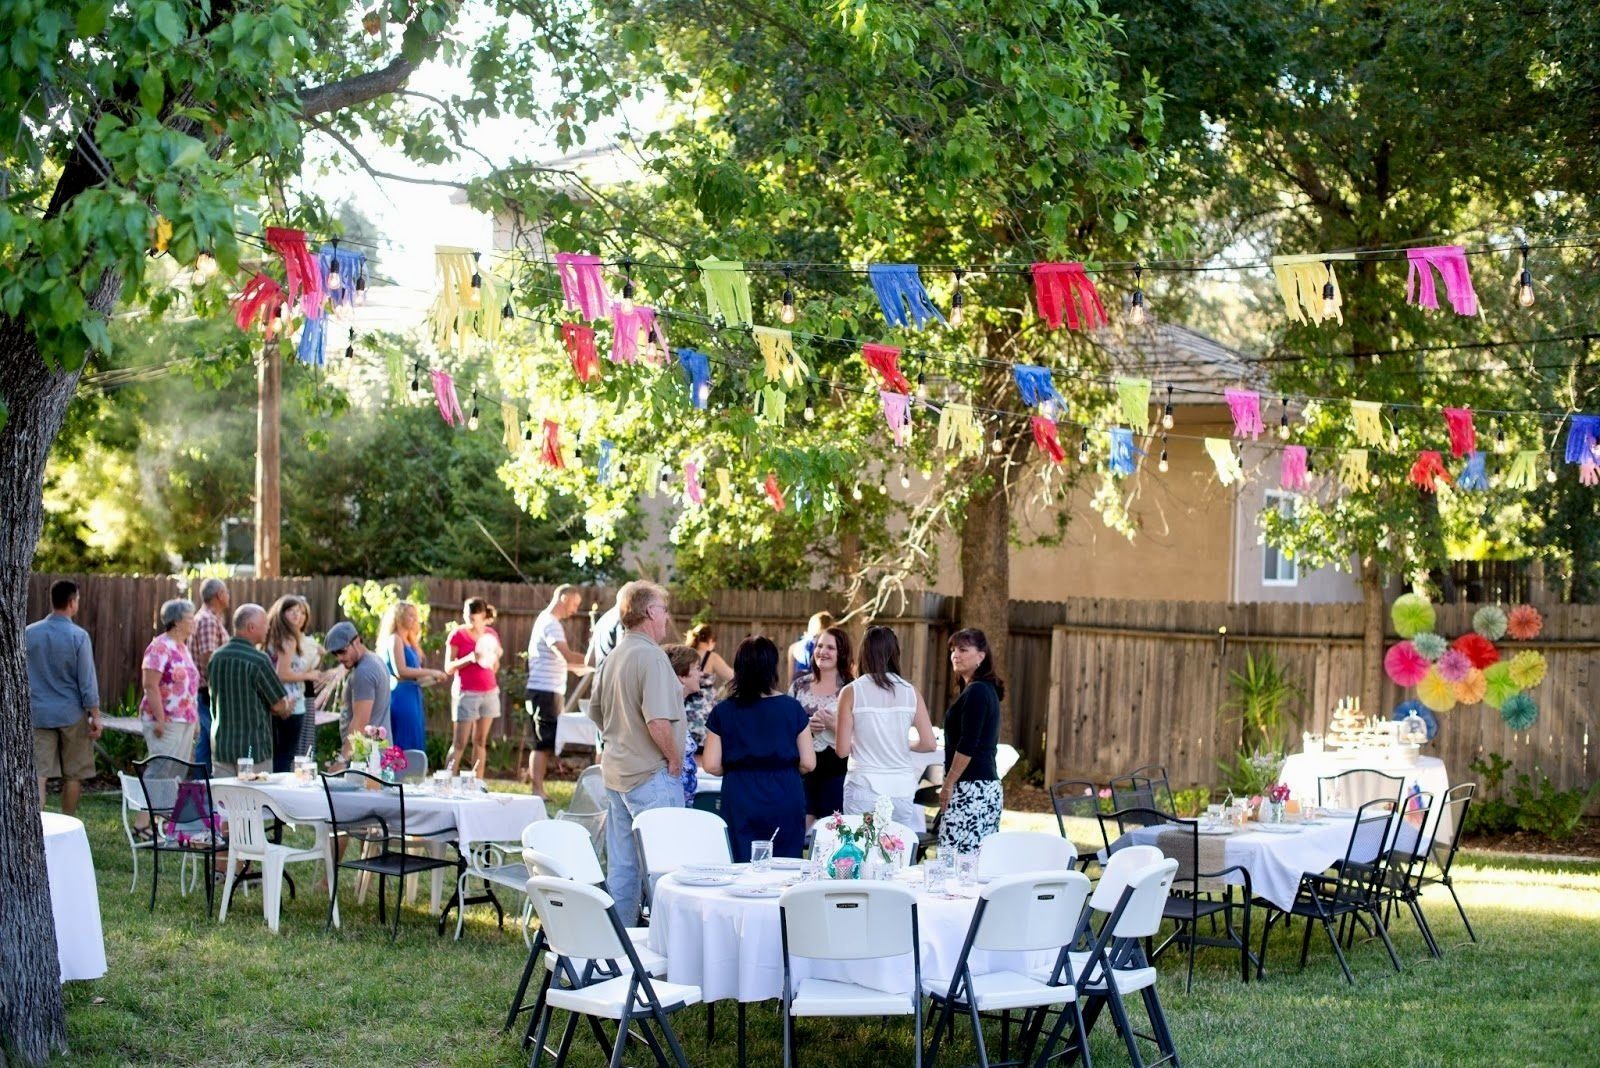 10 Stylish Backyard Birthday Party Ideas For Adults backyard birthday party ideas for adults archives decorating of